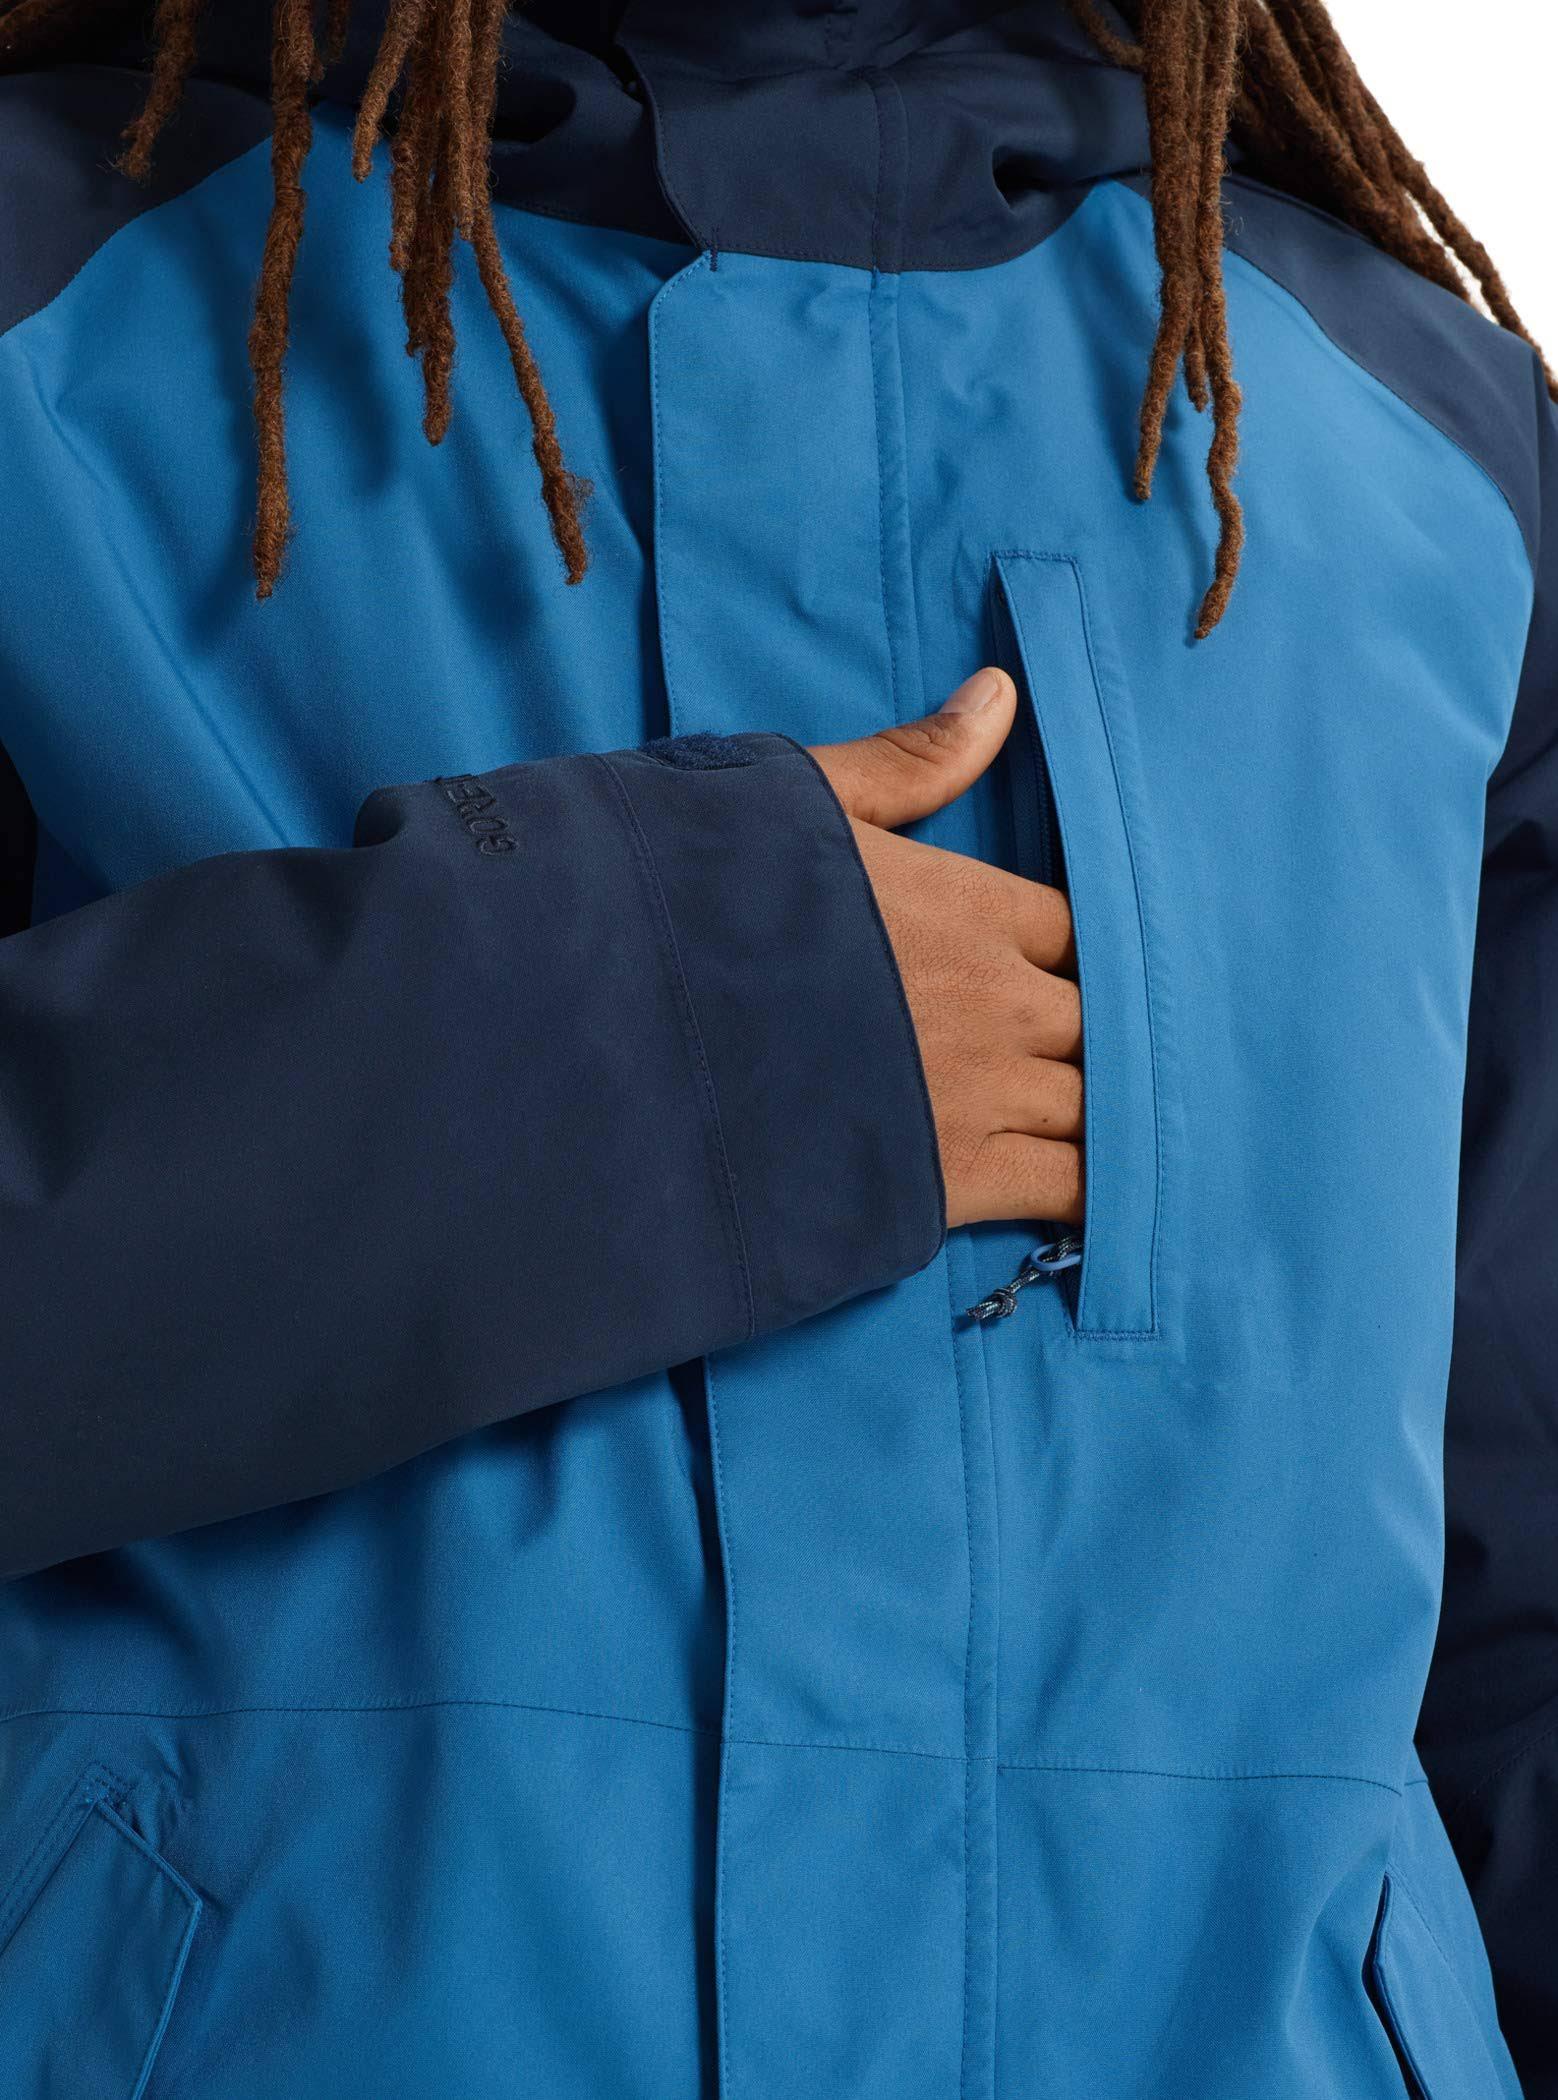 Burton Chaqueta Mediana Vallarta Índigo Hombre Azul Gore Para De tex Radial Humor 55x1Urwq4